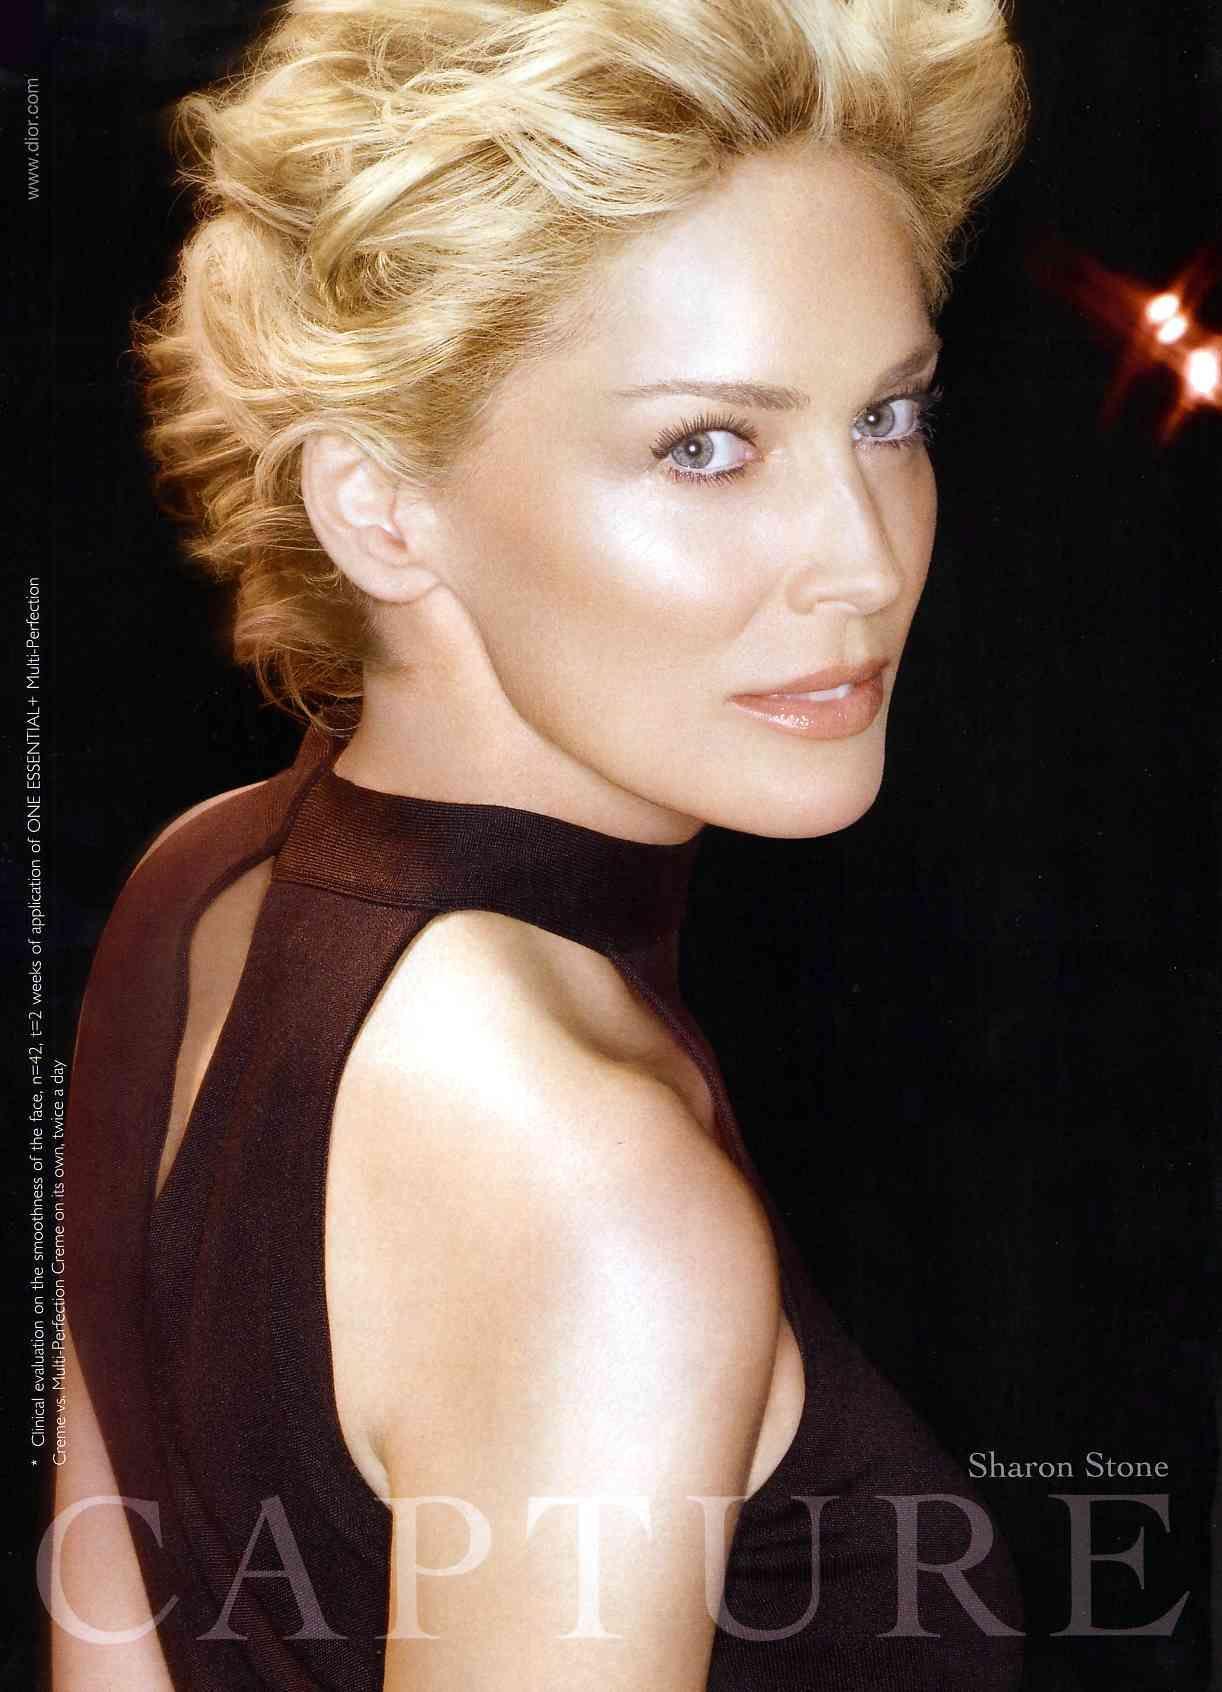 Publicitessharonstone Publicites Sharon Stone Sharonstone Sharon Stone Sharon Stone Hairstyles Short Hair Styles Famous Blondes